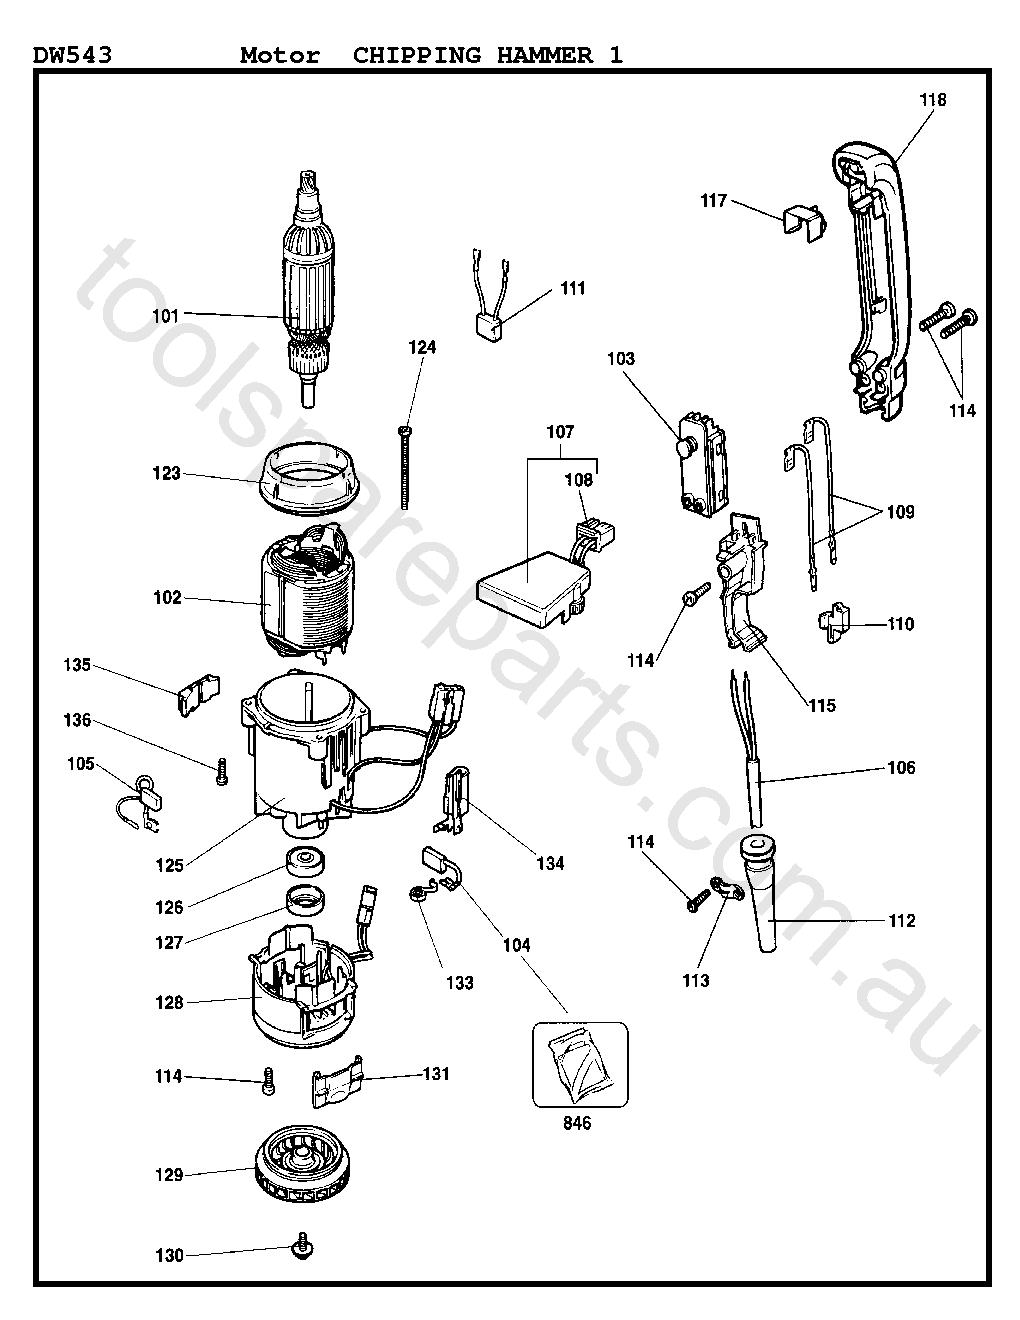 DeWalt DW543 - Type 1  Diagram 3